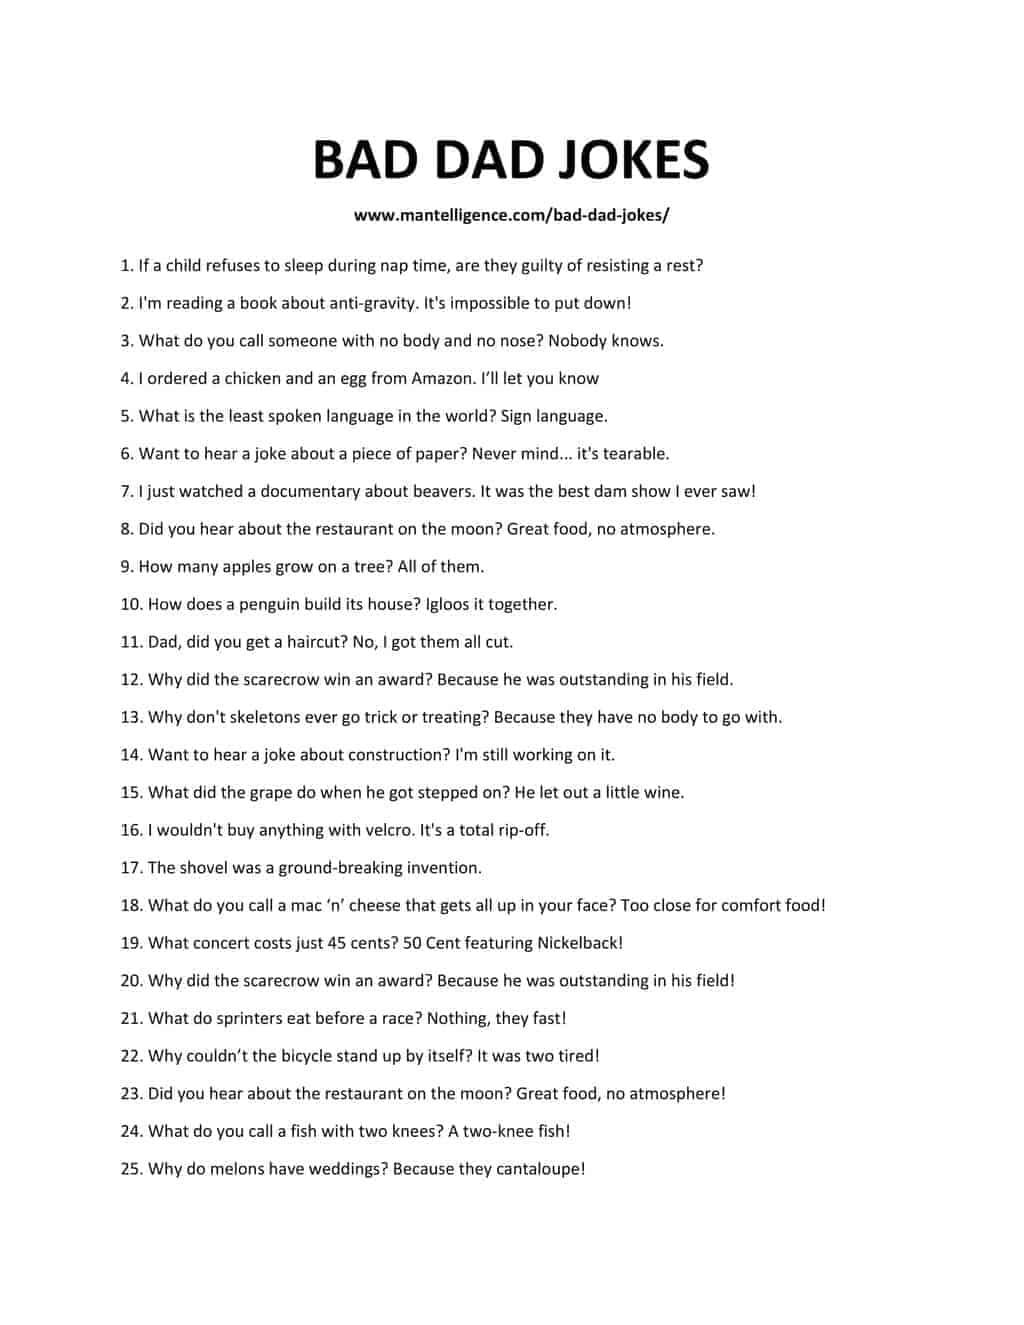 BAD_DAD_JOKES-1[1]